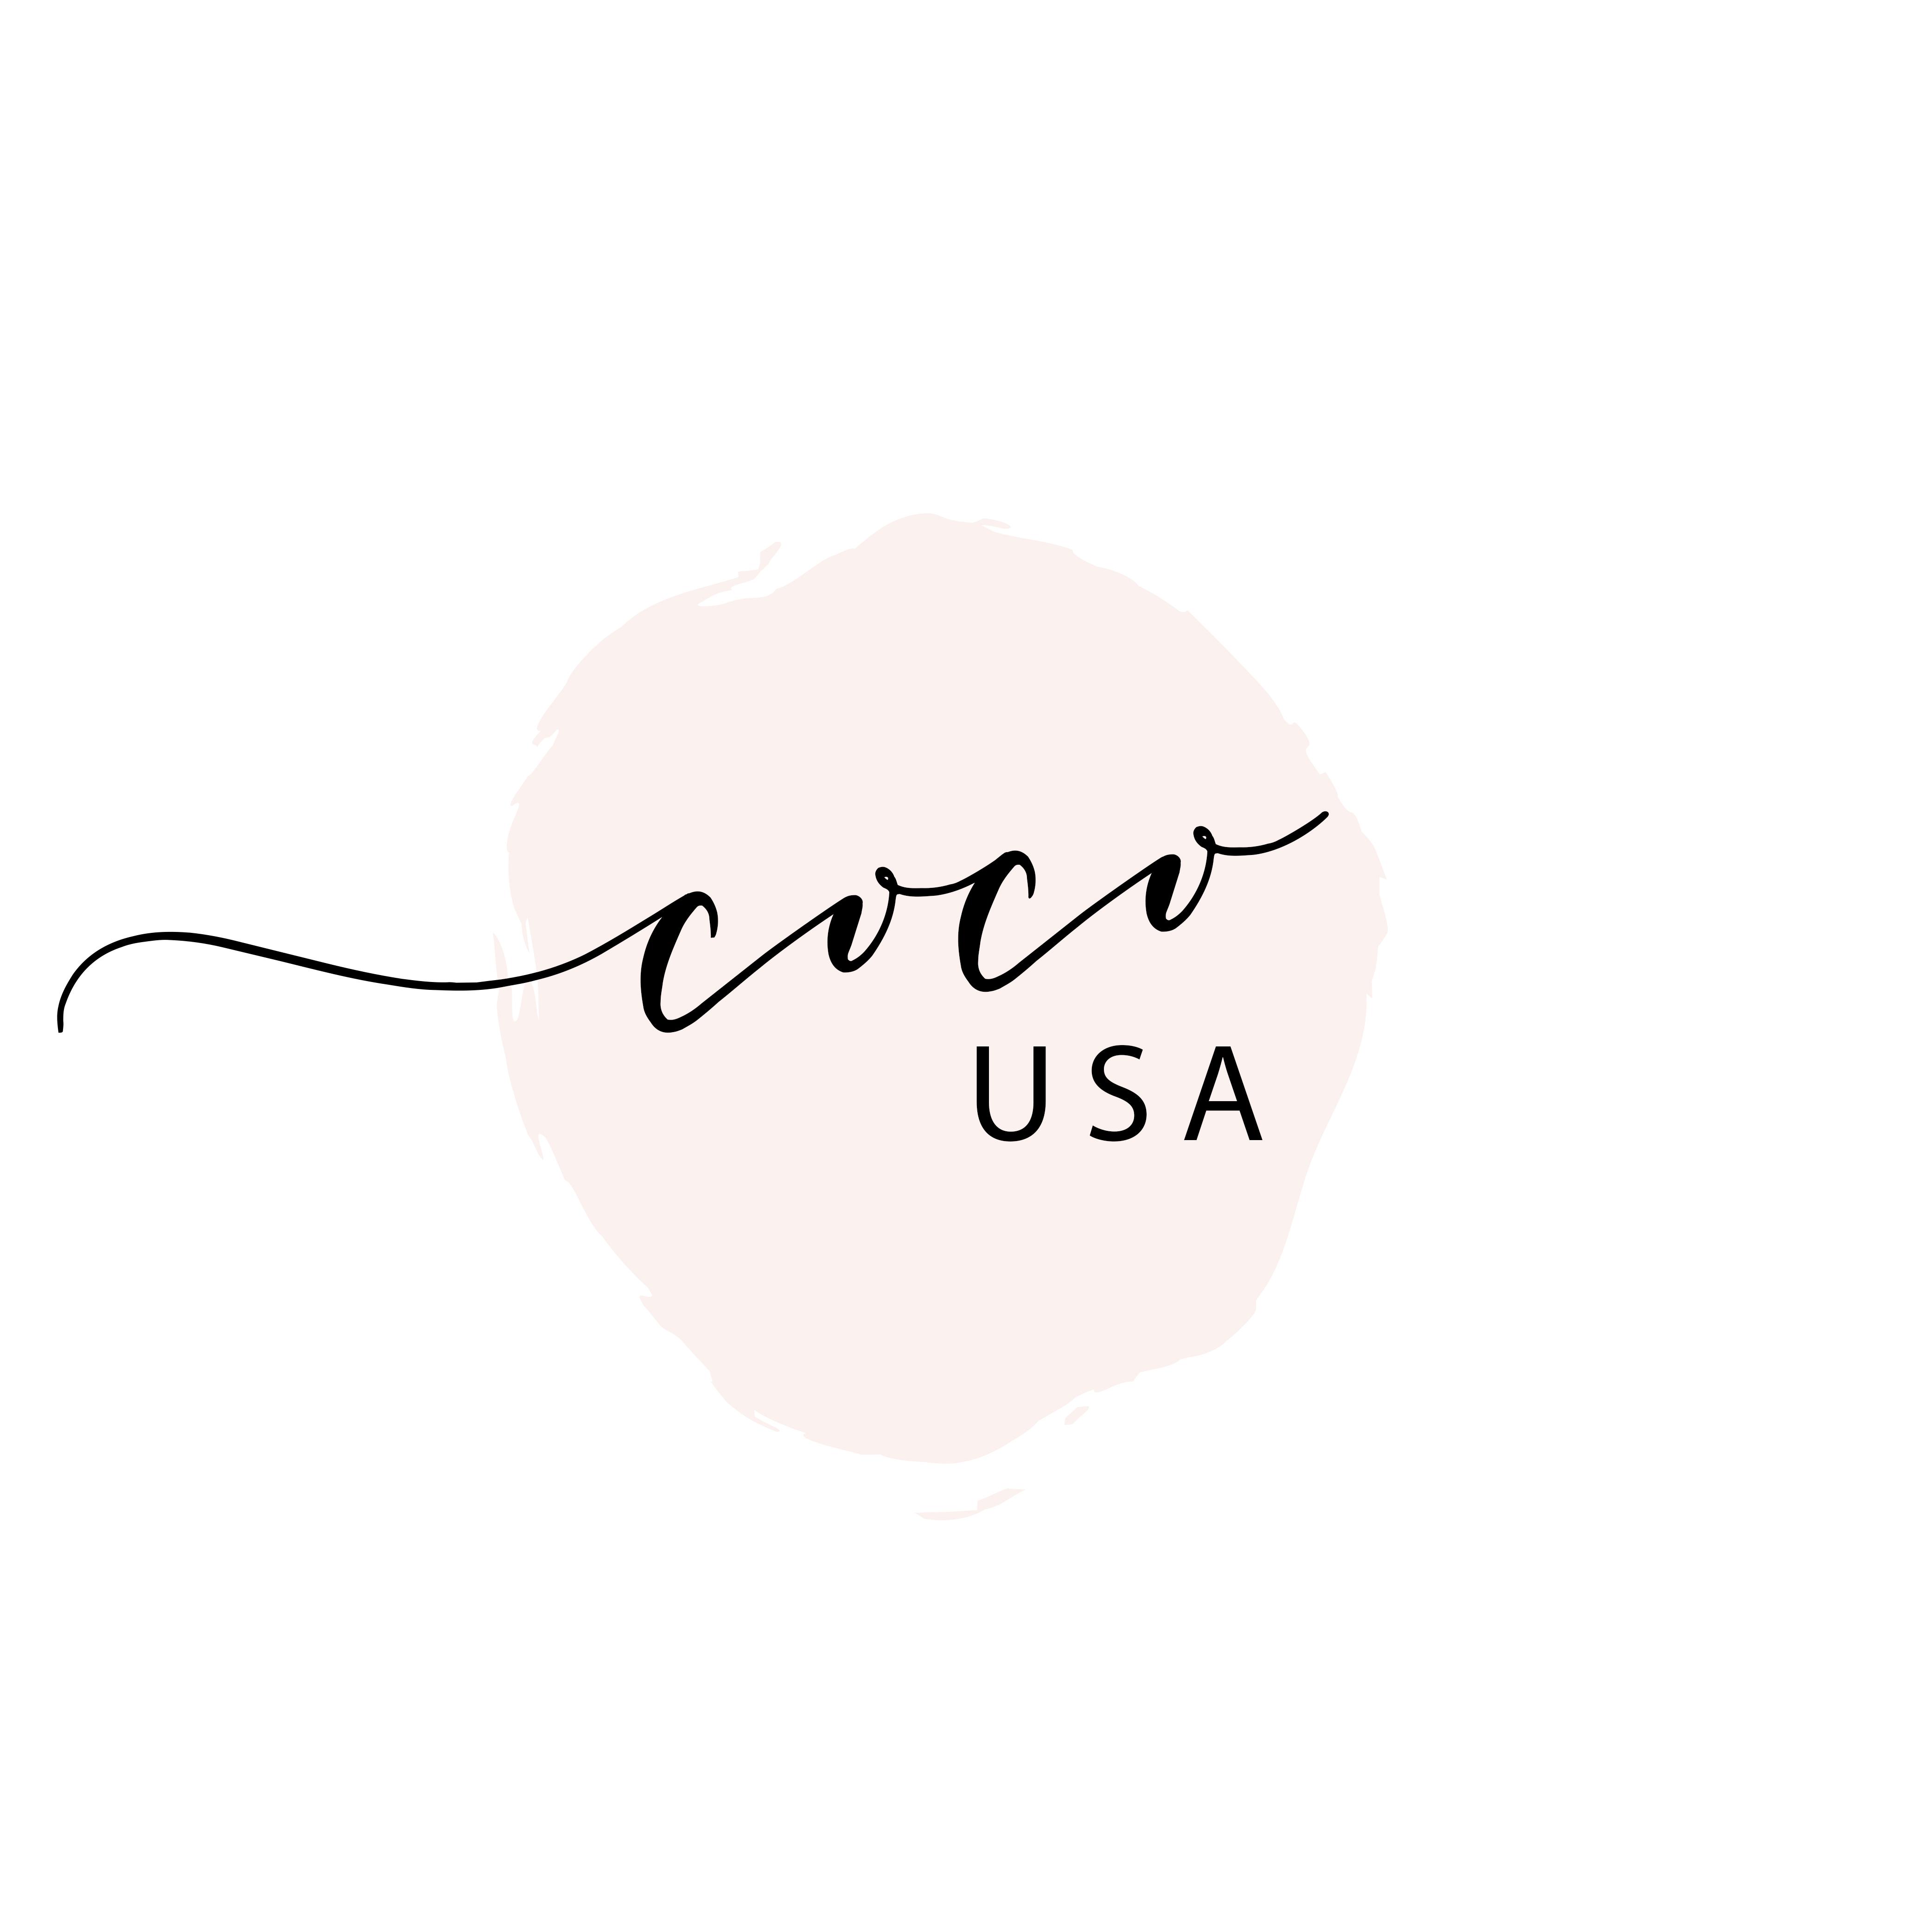 COCO USA Group INC